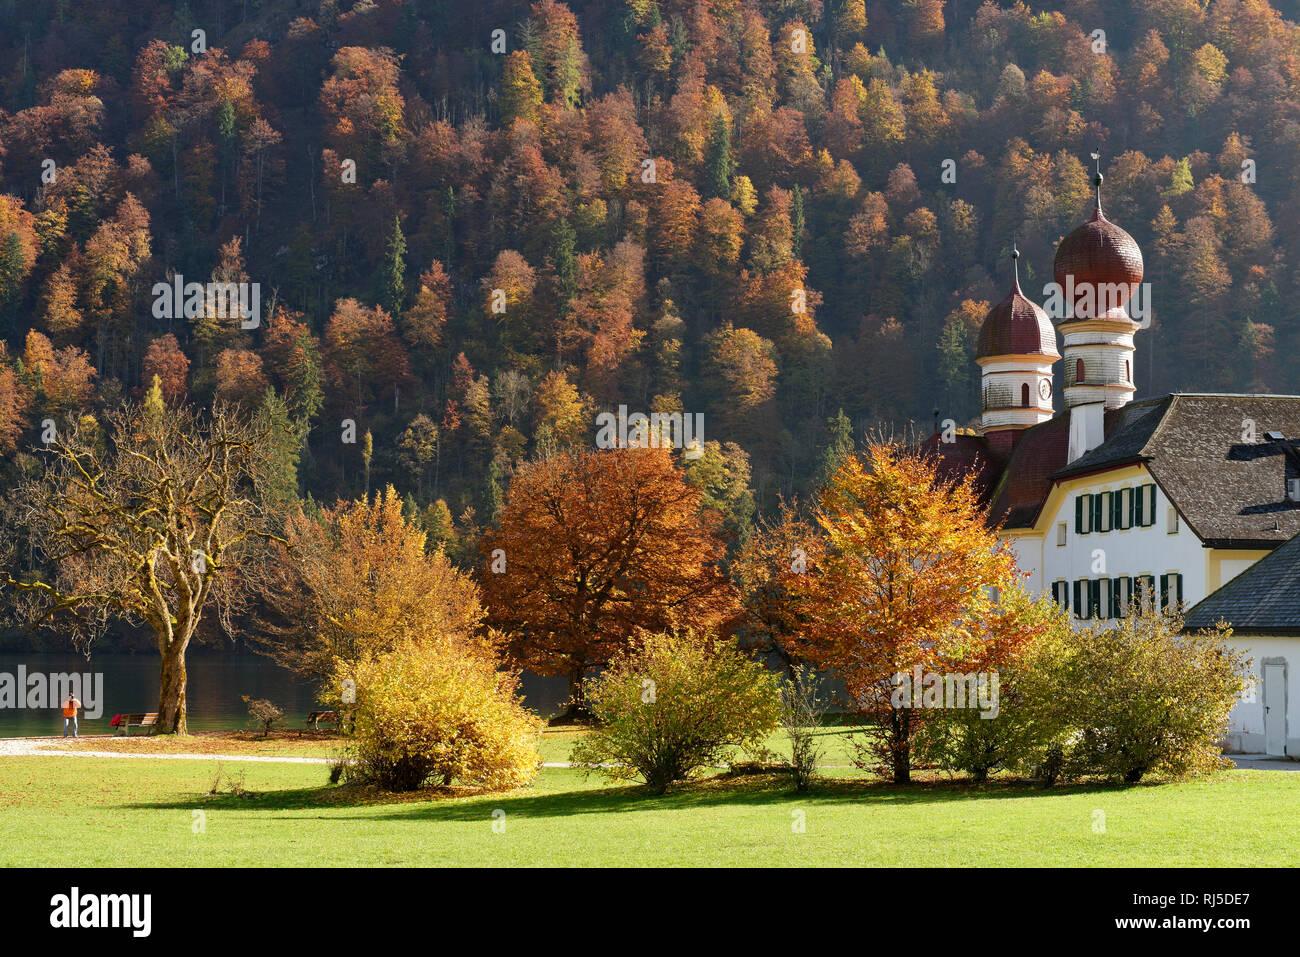 St. Bartholomä am Königssee, Berchtesgaden, Oberbayern, Bayern, Deutschland - Stock Image